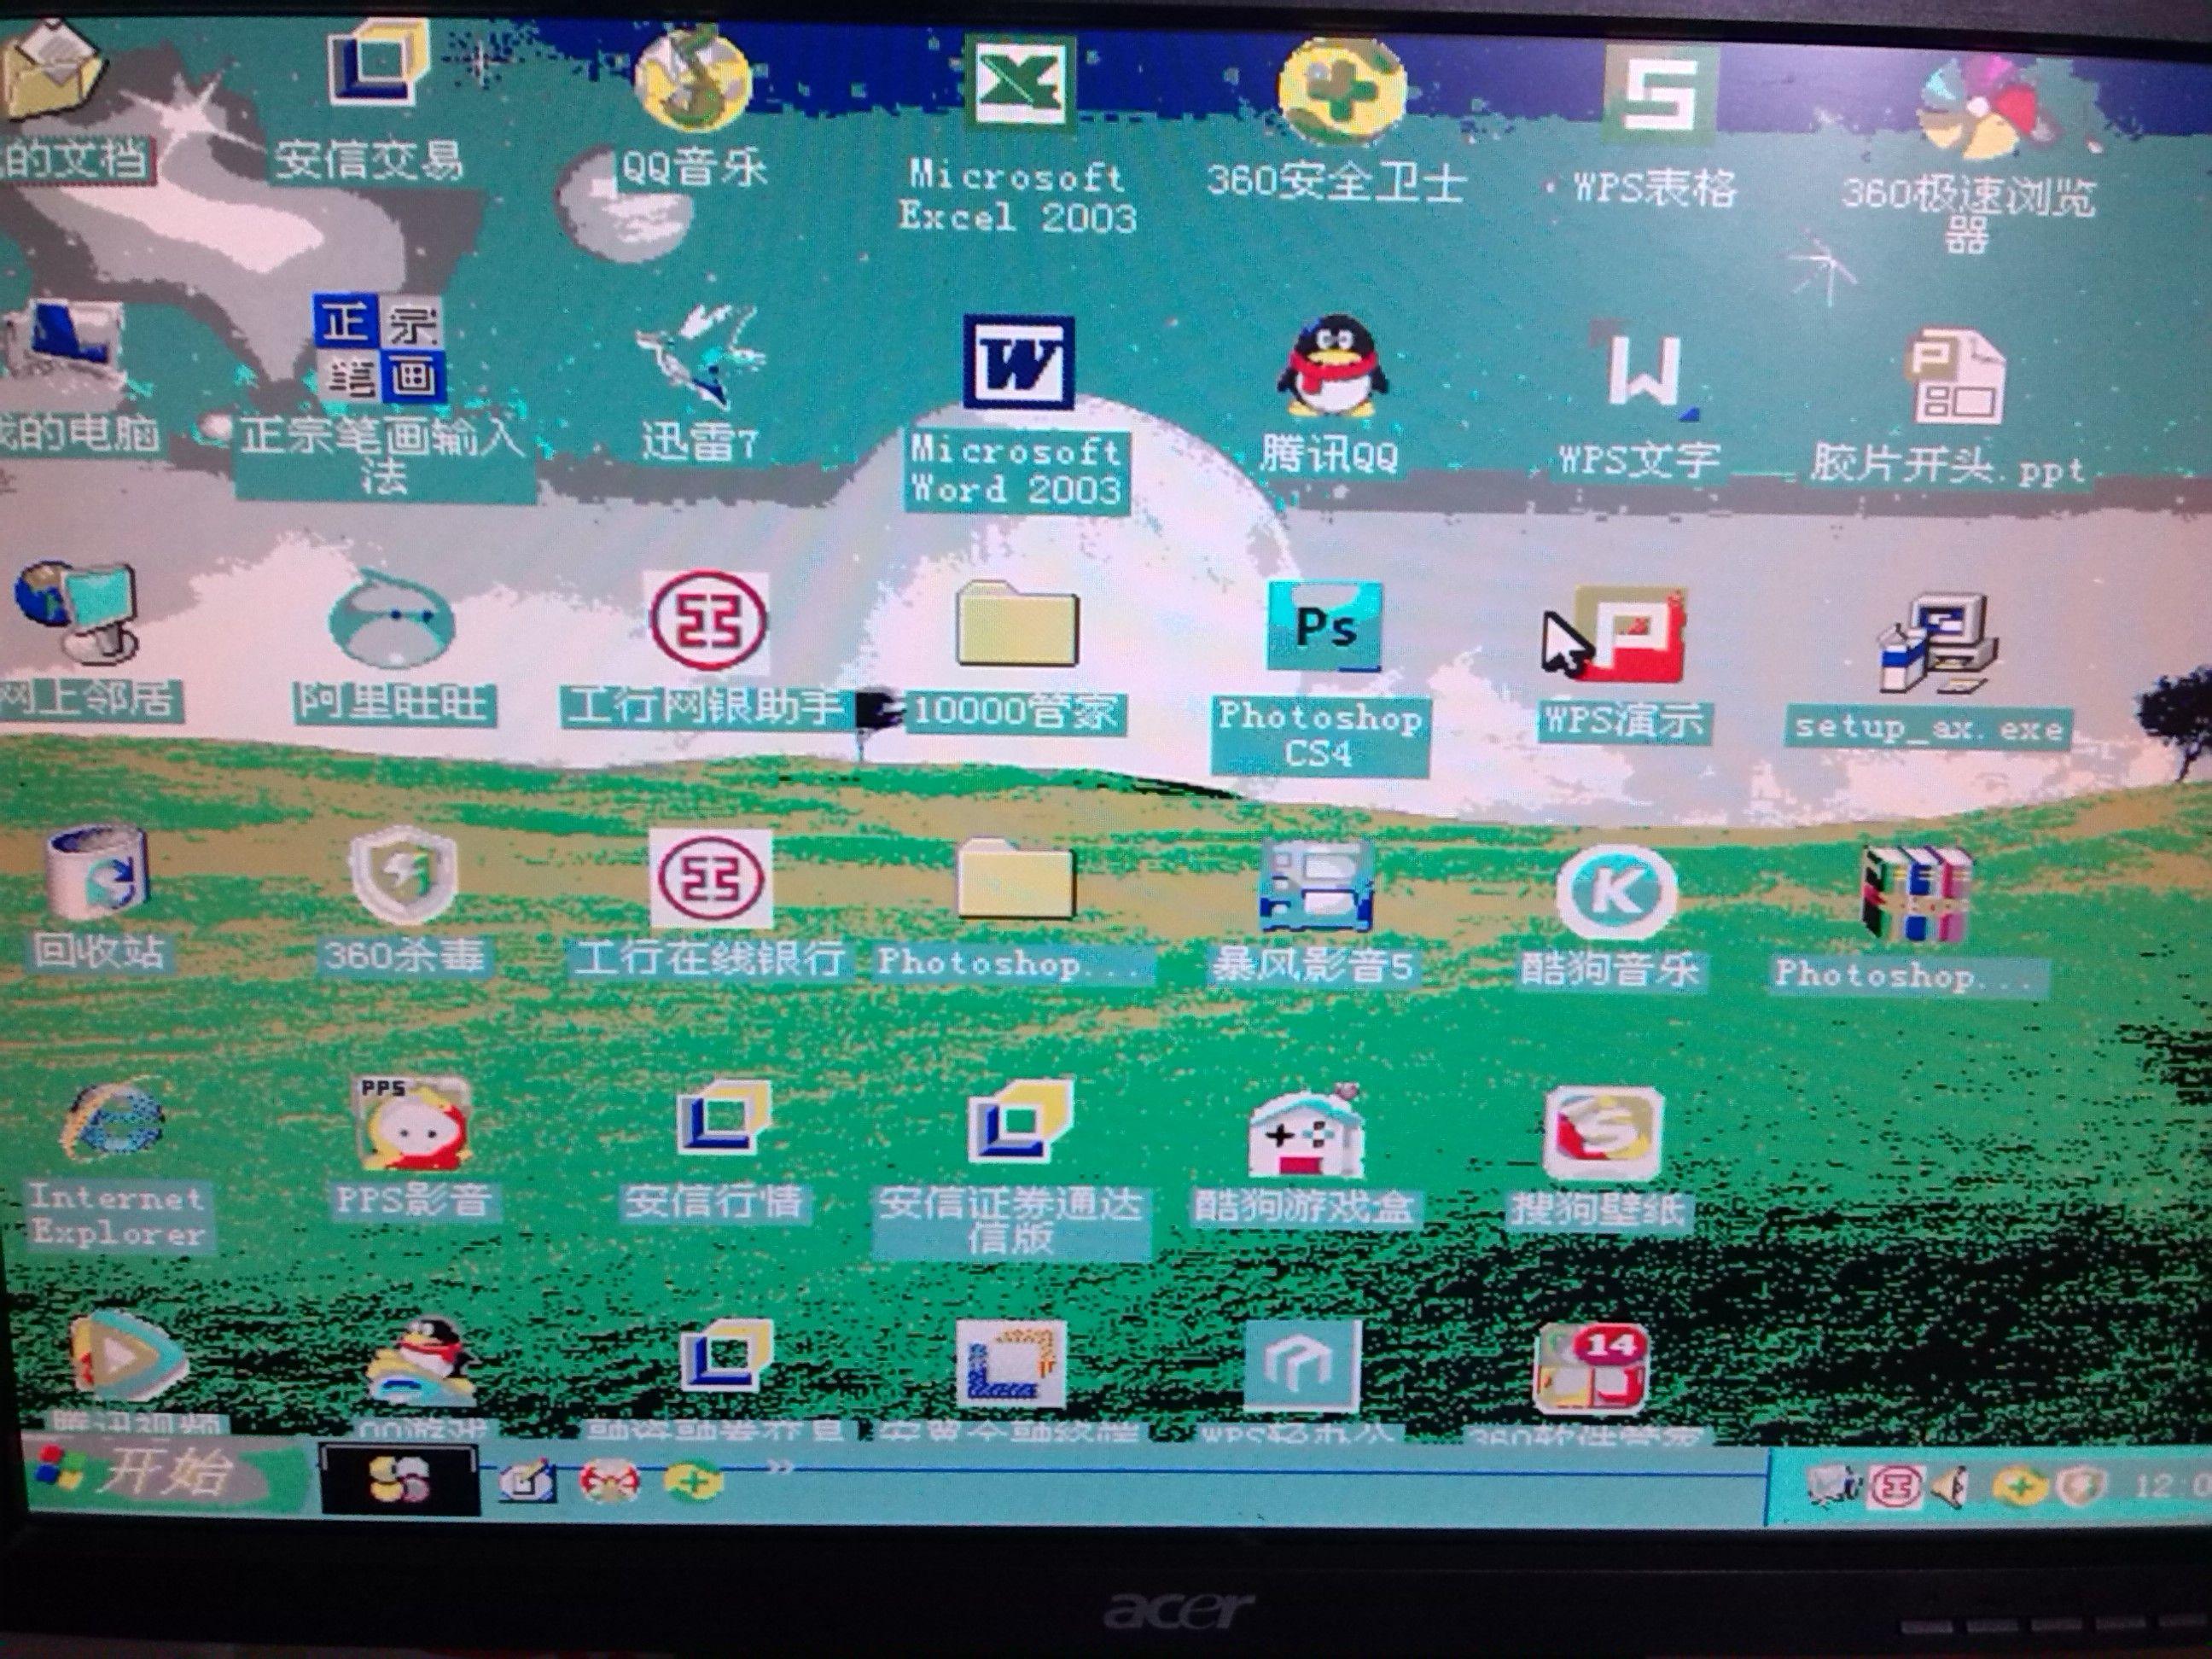 QKA棋牌下载 QKA棋牌 安卓版v94.1.20180 - PC6手游网 《FIFA足球世界杯2010》与《Fqka棋牌游戏官方下载IFA足球世界杯2006》一样,是EA公司针对4年一度的世界杯大赛而专门制作的FIFA特别游戏。这次游戏的背景将会转向南非,199支参赛球队..FIFA世界足球2010中文版下载汉化硬盘版_fifa2010世界杯pc IT猫扑网